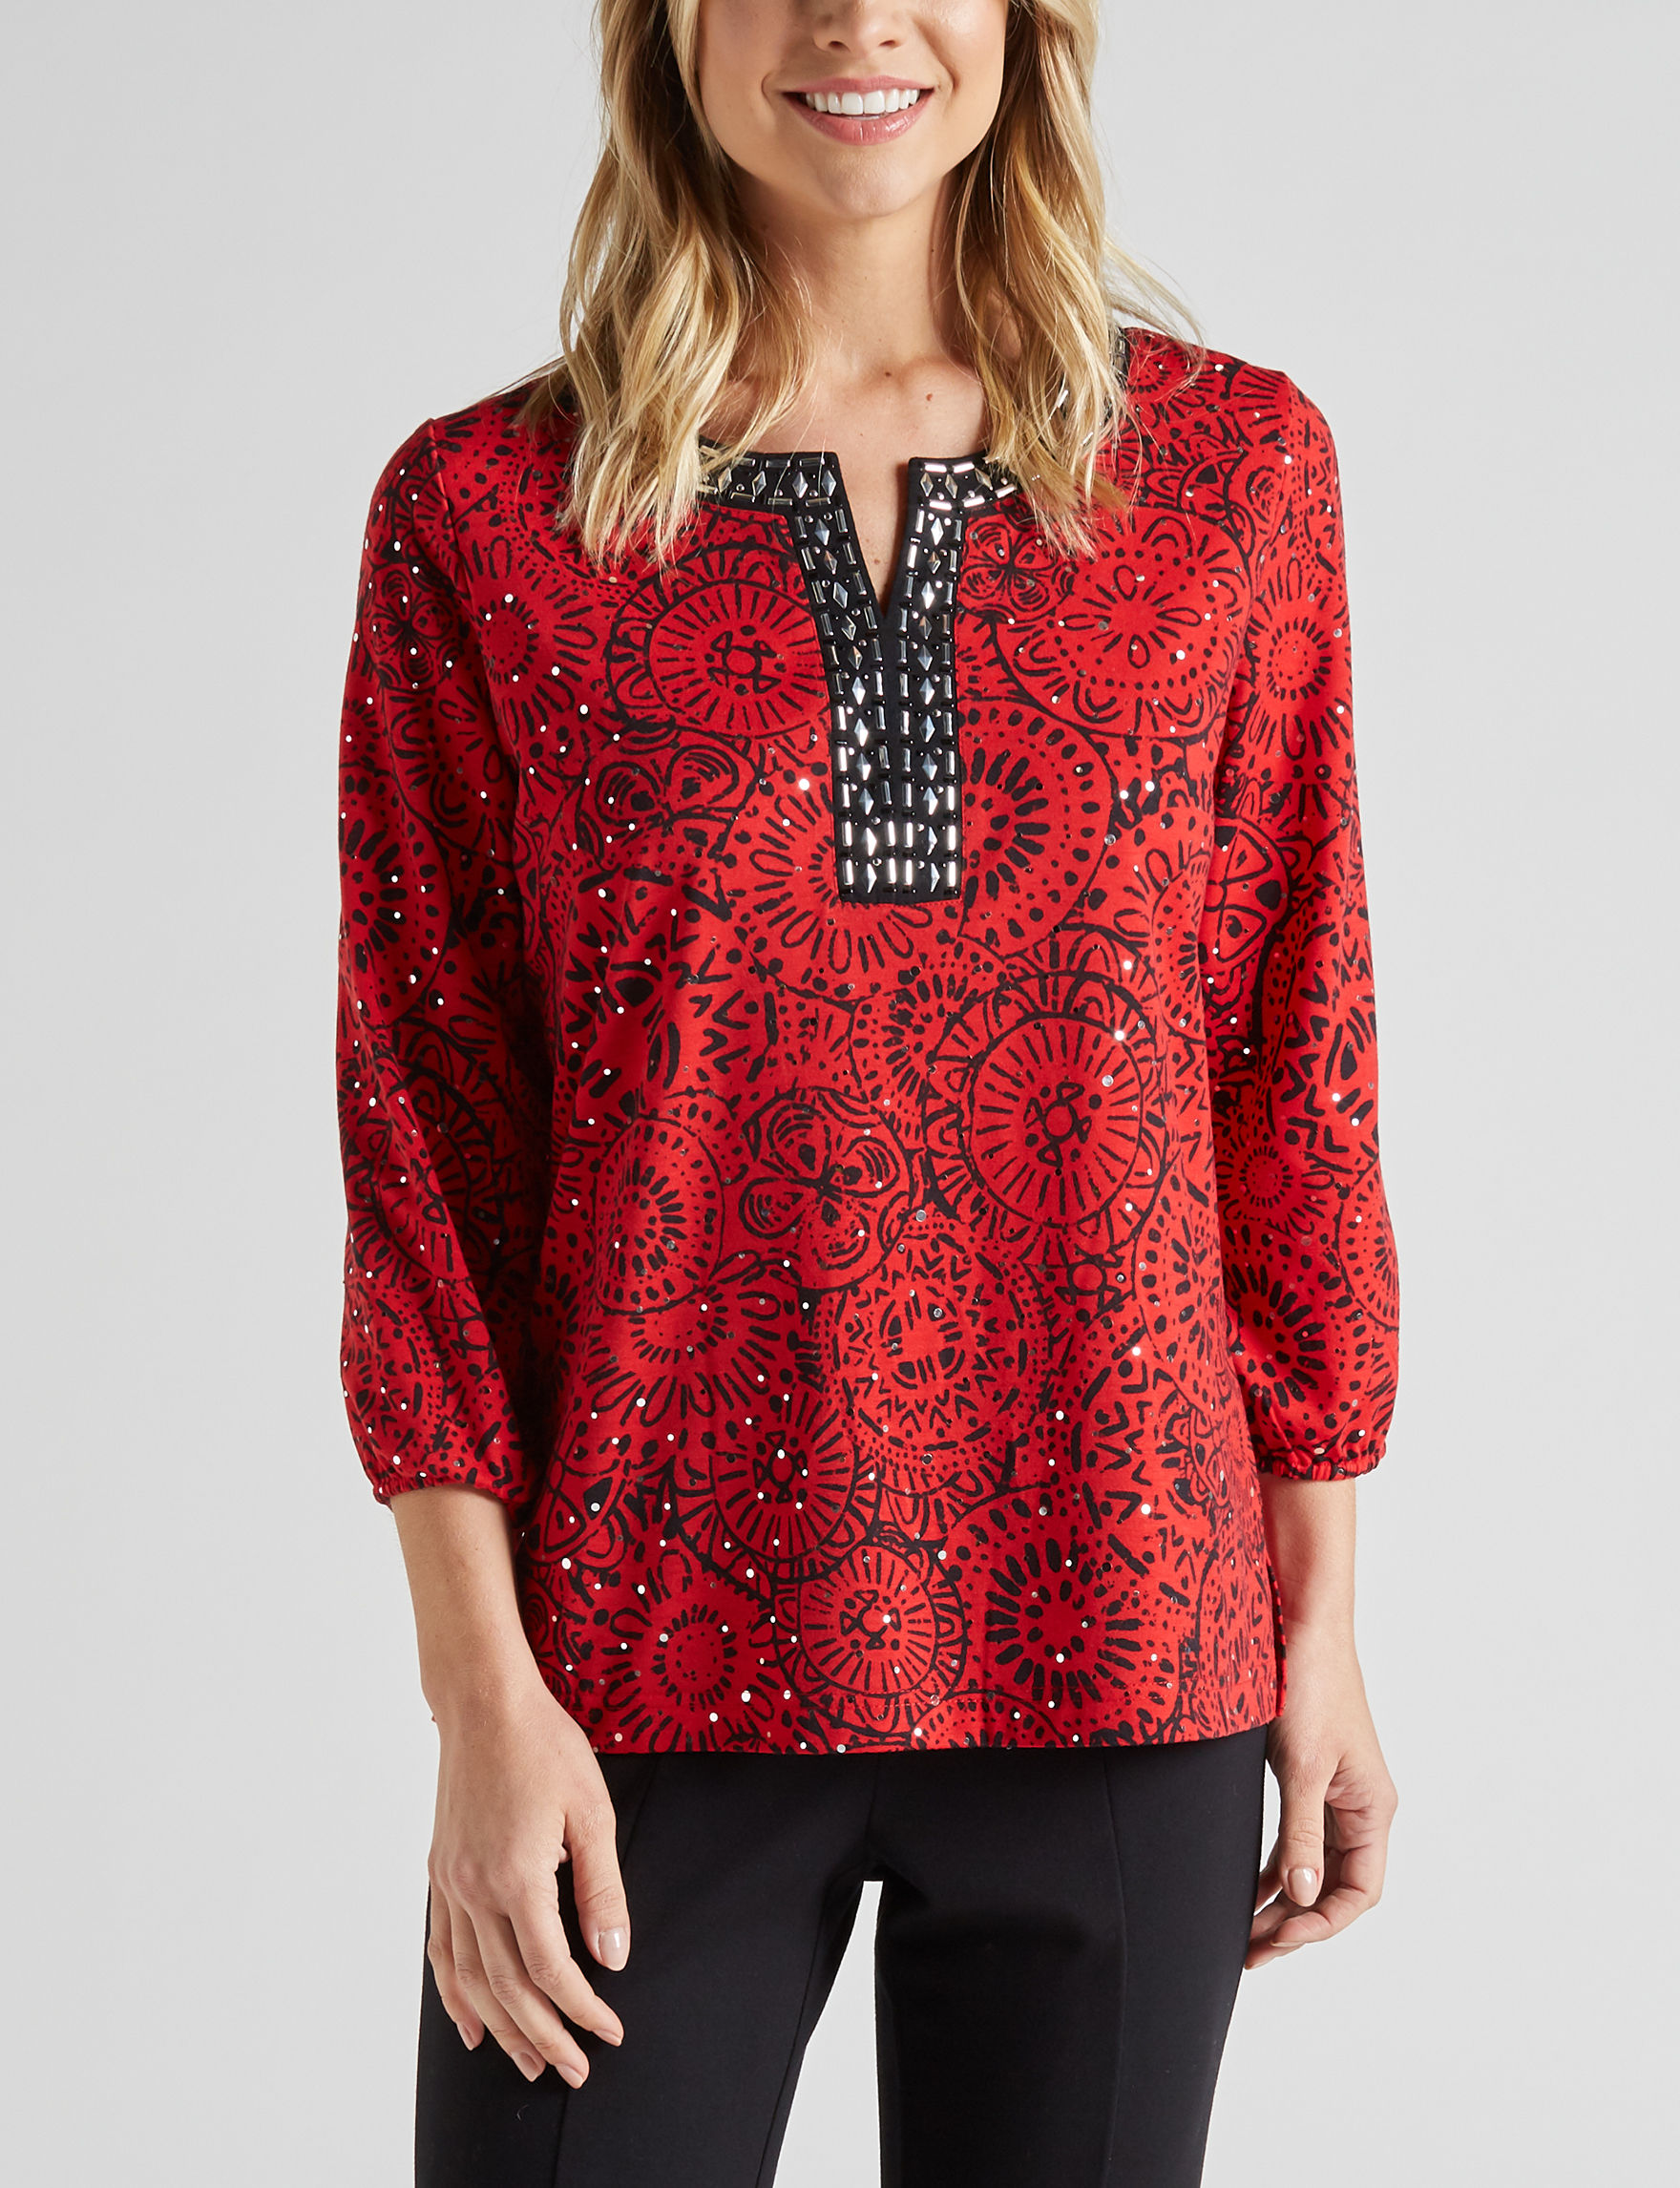 Cathy Daniels Red / Black Shirts & Blouses